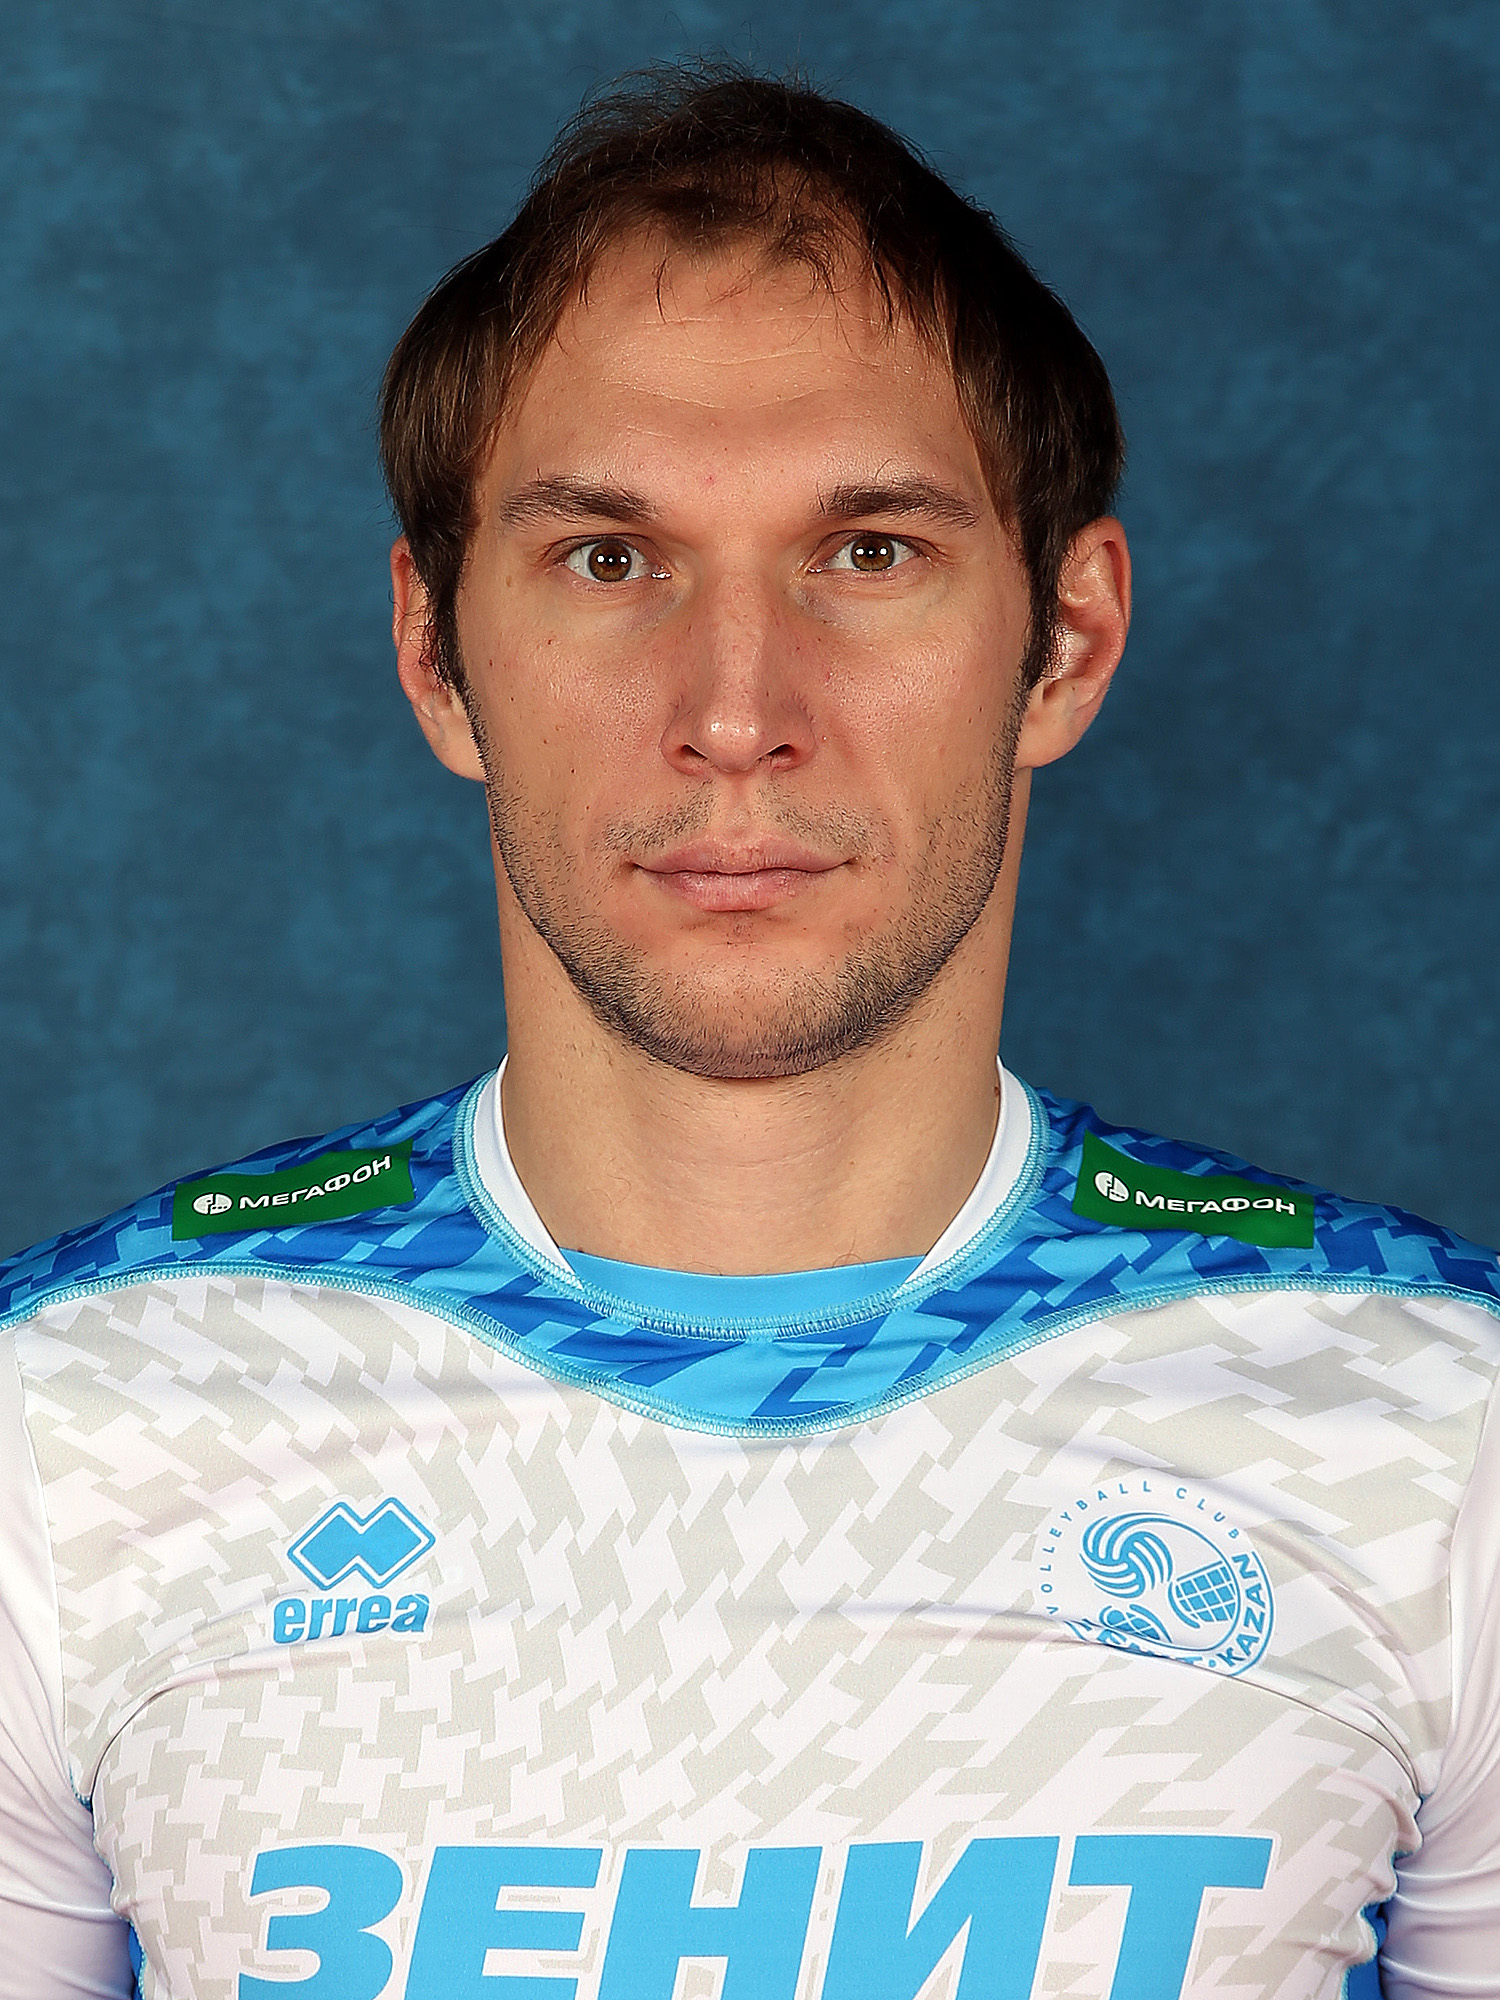 Andrey Ashchev